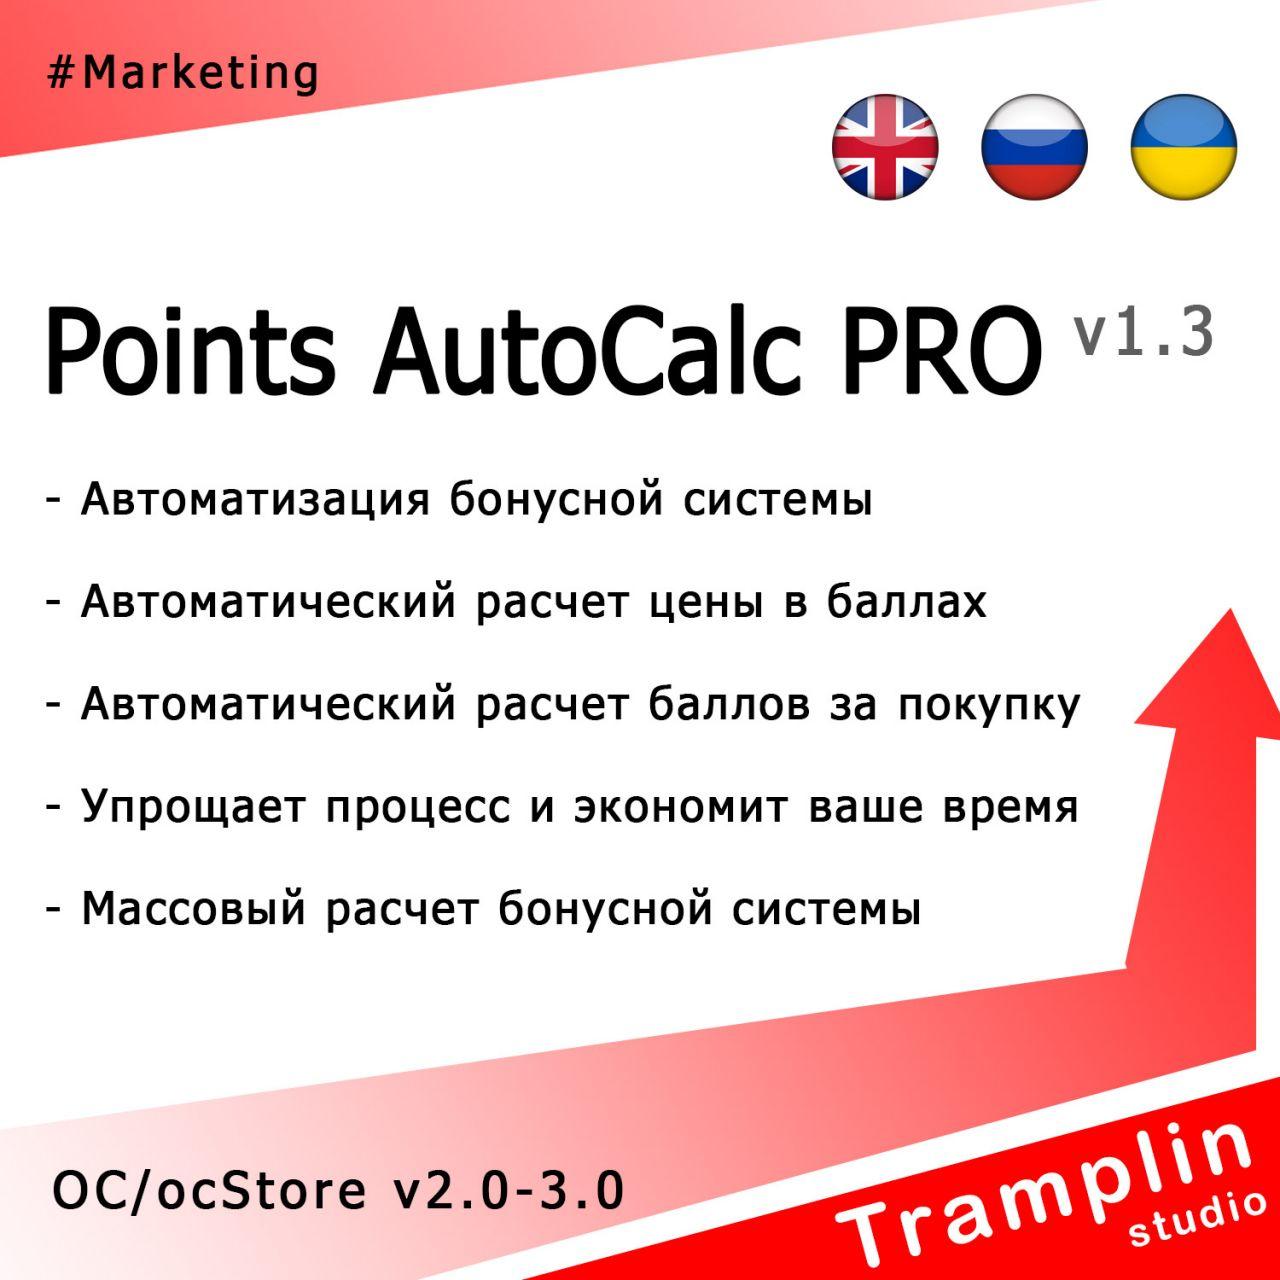 TS Points AutoCalc PRO из категории Цены, скидки, акции, подарки для CMS OpenCart (ОпенКарт)